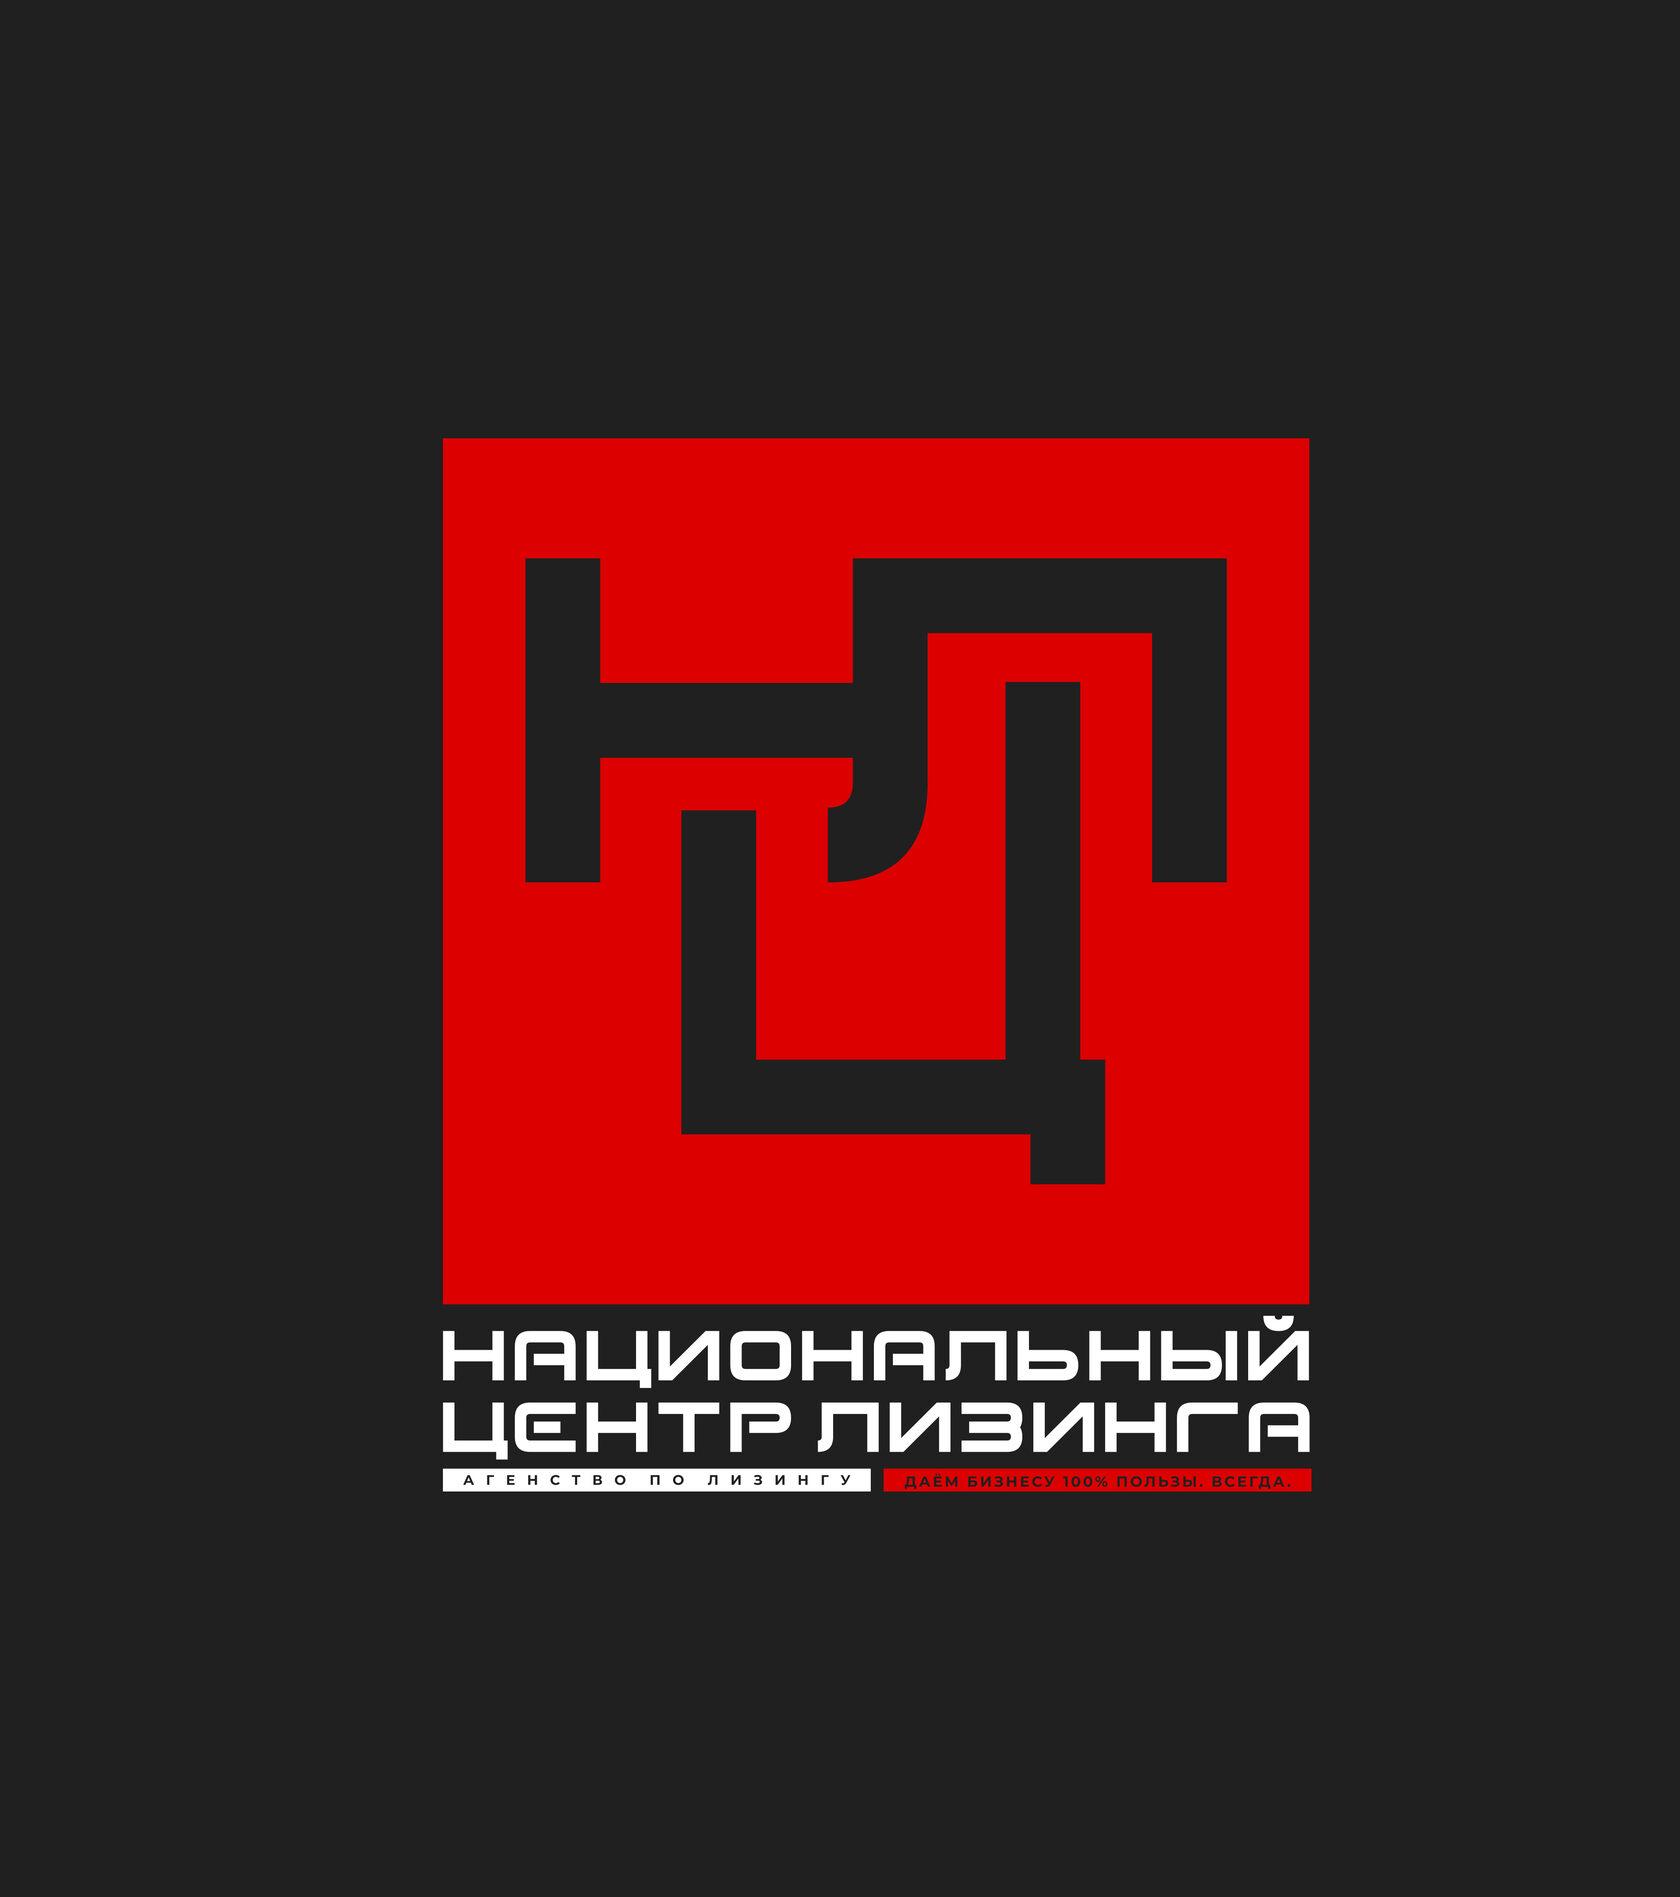 Московский Центр Лизинга | +74951284643 | 1-й Нагатинский пр., 10